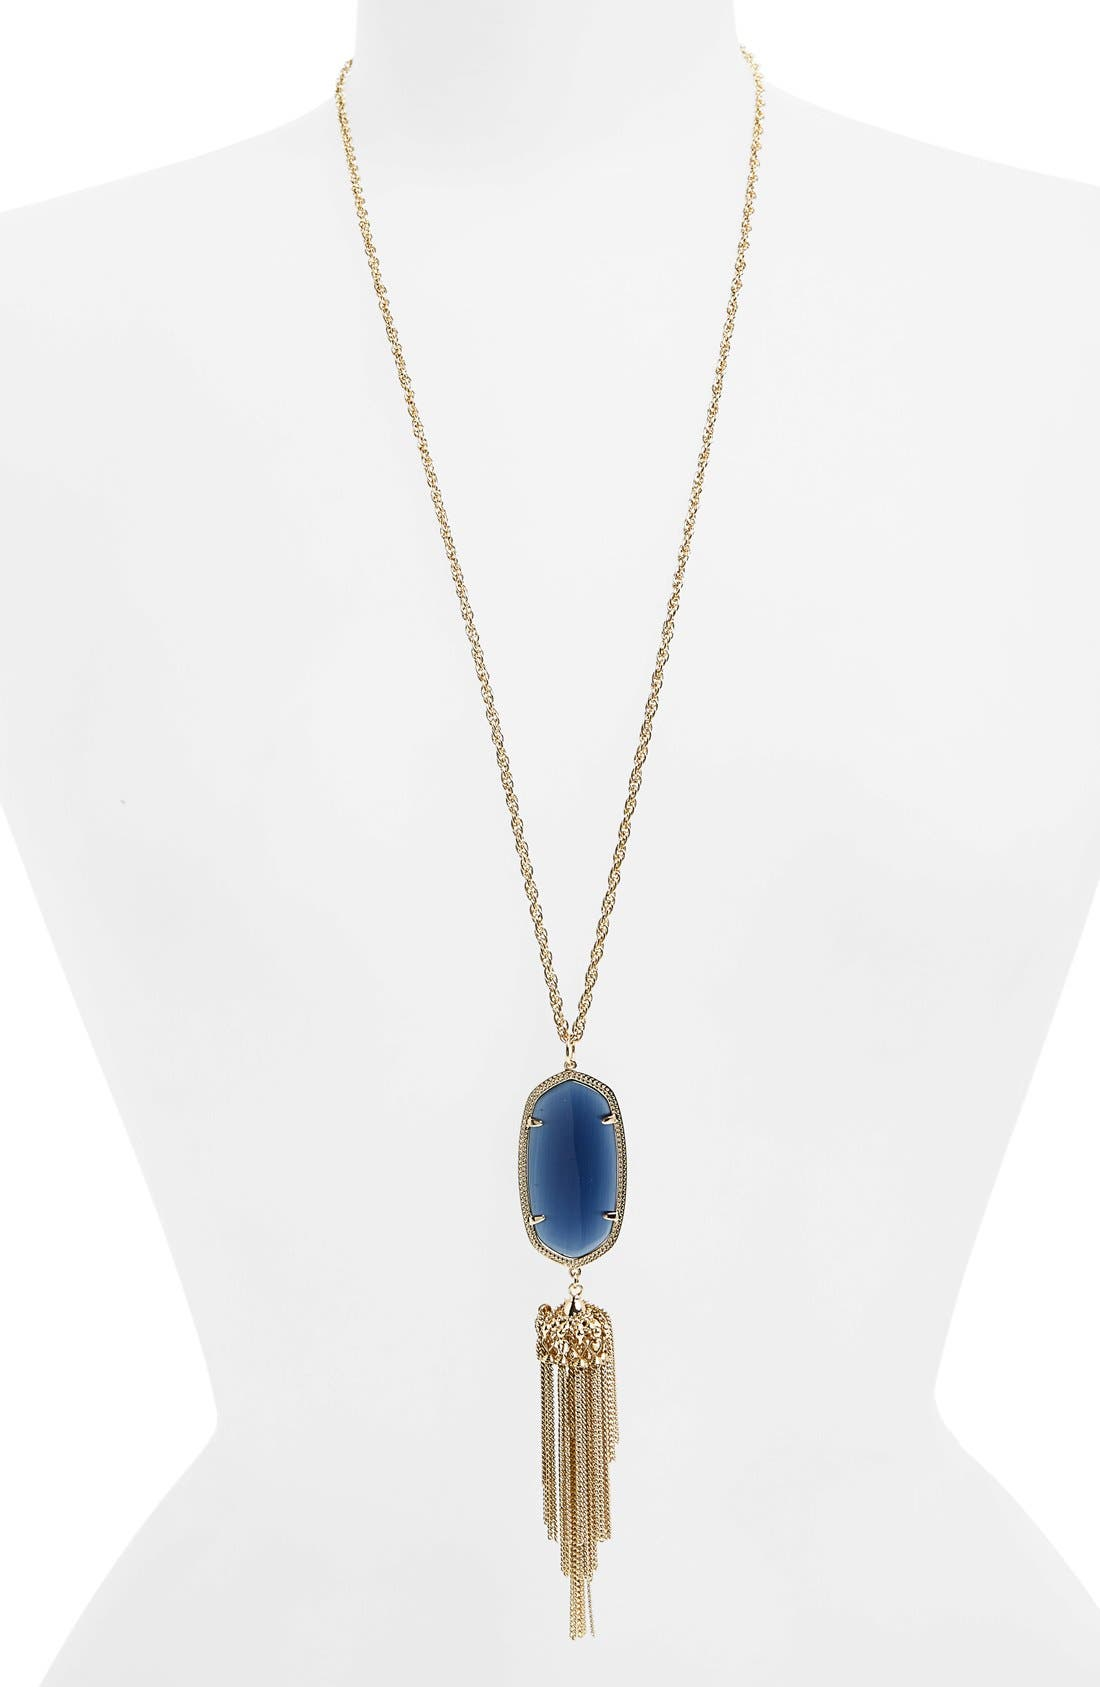 Main Image - Kendra Scott 'Rayne' Tassel Pendant Necklace